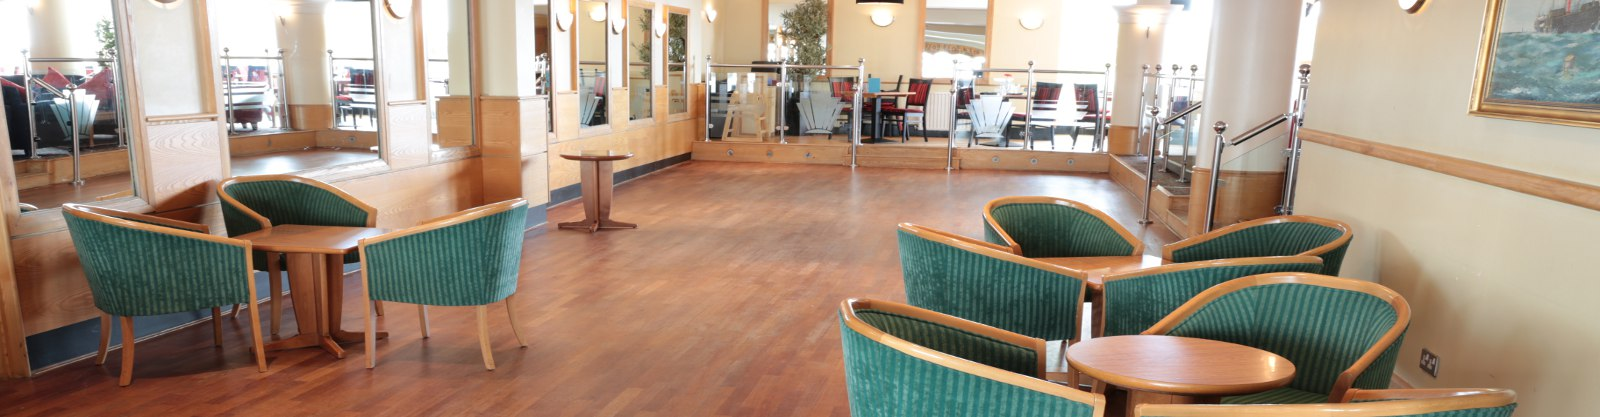 reception-bar-riviera-hotel-bournemouth